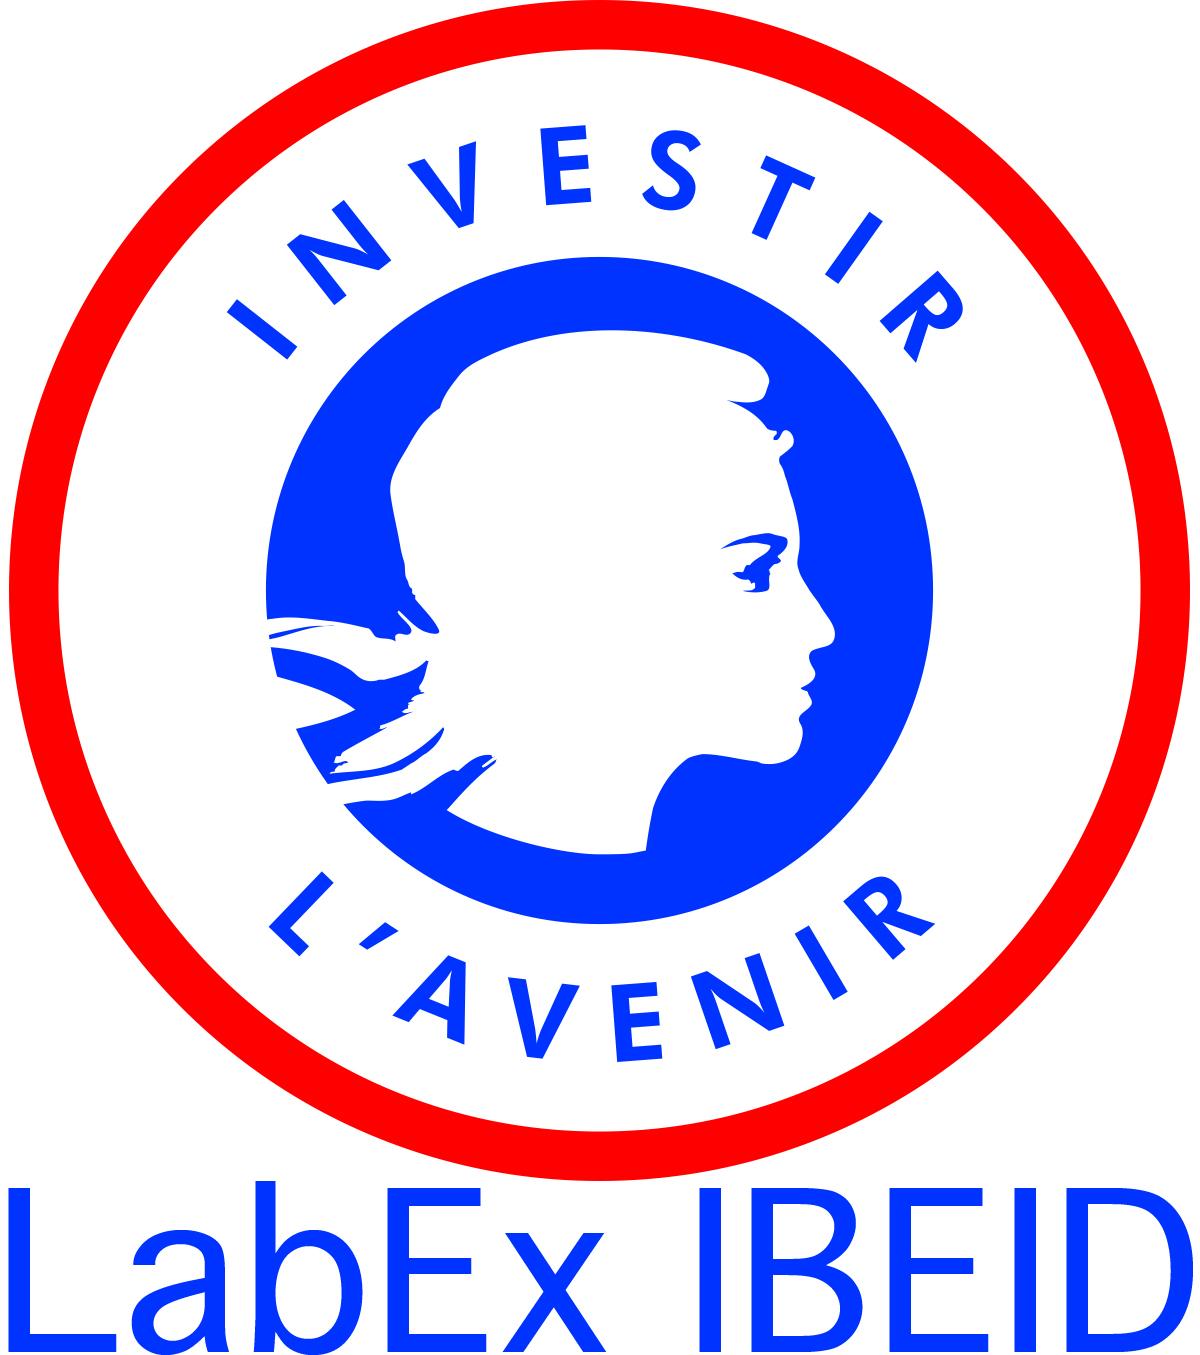 Pascale Cossart Philippe Sansonetti Labex Ibeid Integrative